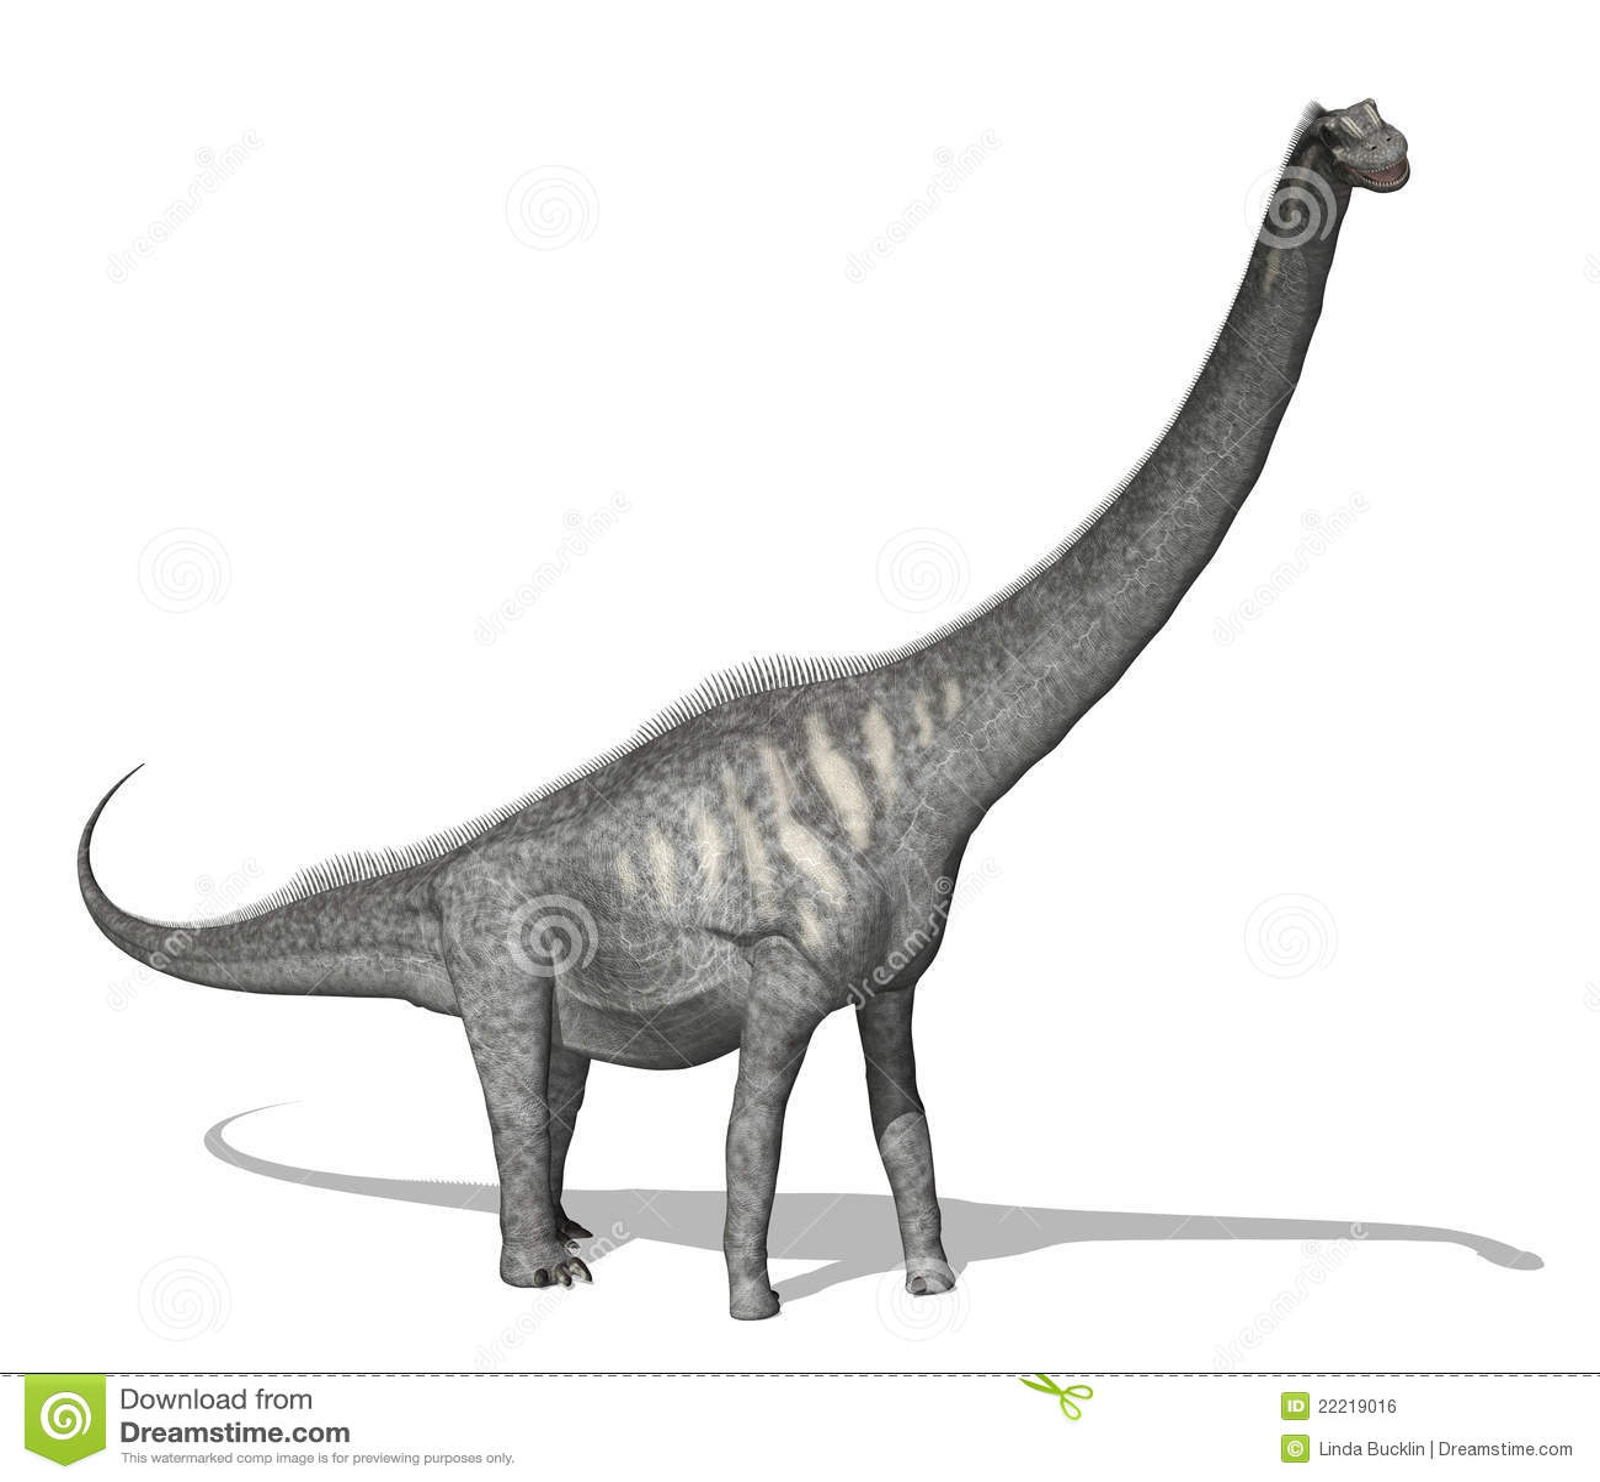 The Sauroposeidon dino...